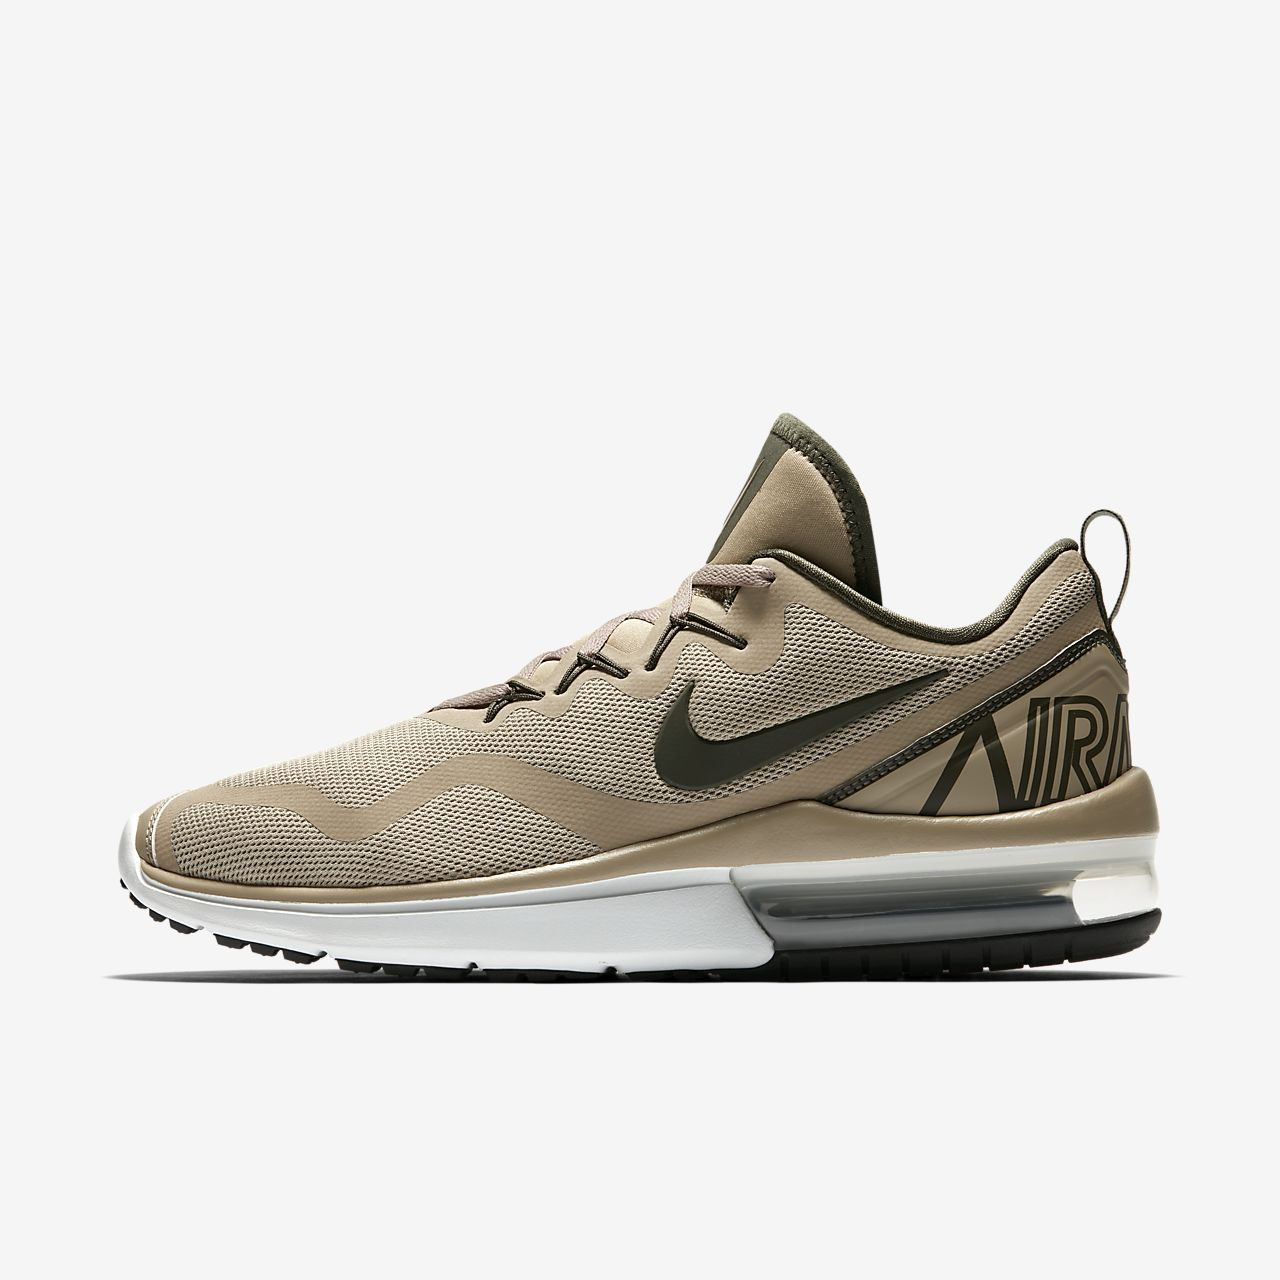 half off 85781 98811 ... Męskie buty do biegania Nike Air Max Fury